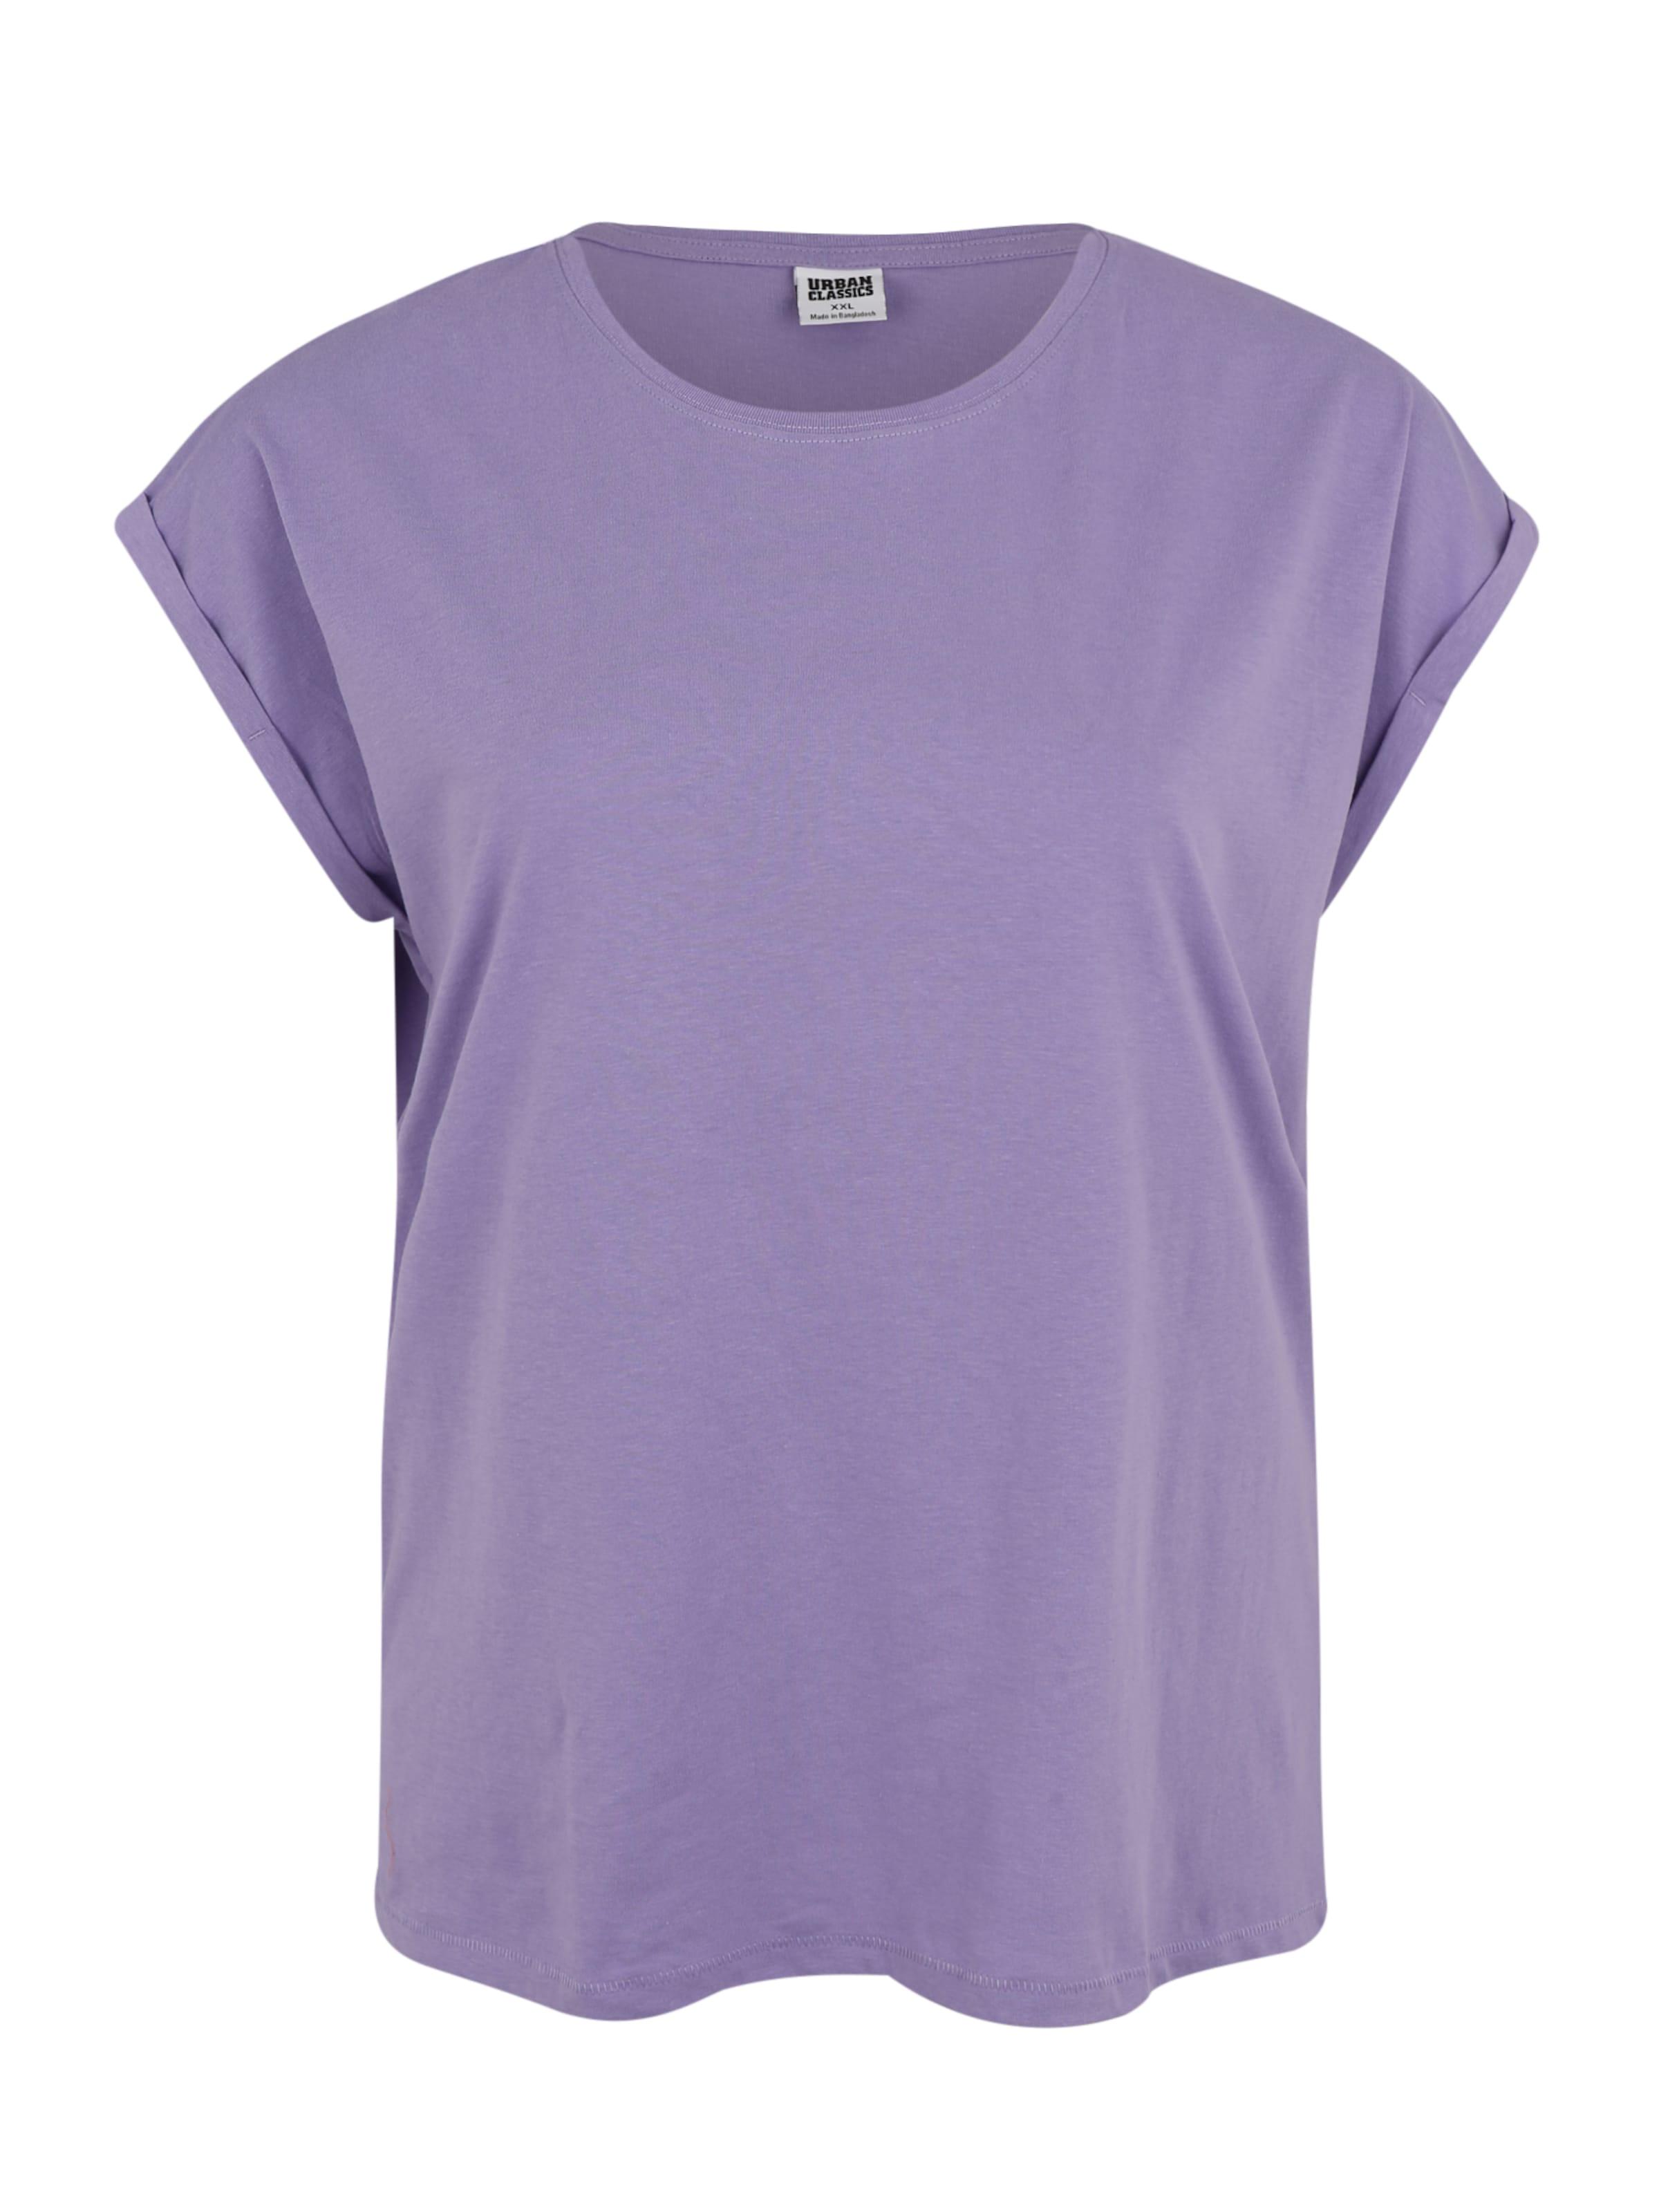 Curvy Mwnn0o8v In Classics Lavendel Shirt Urban vmO8n0Nw